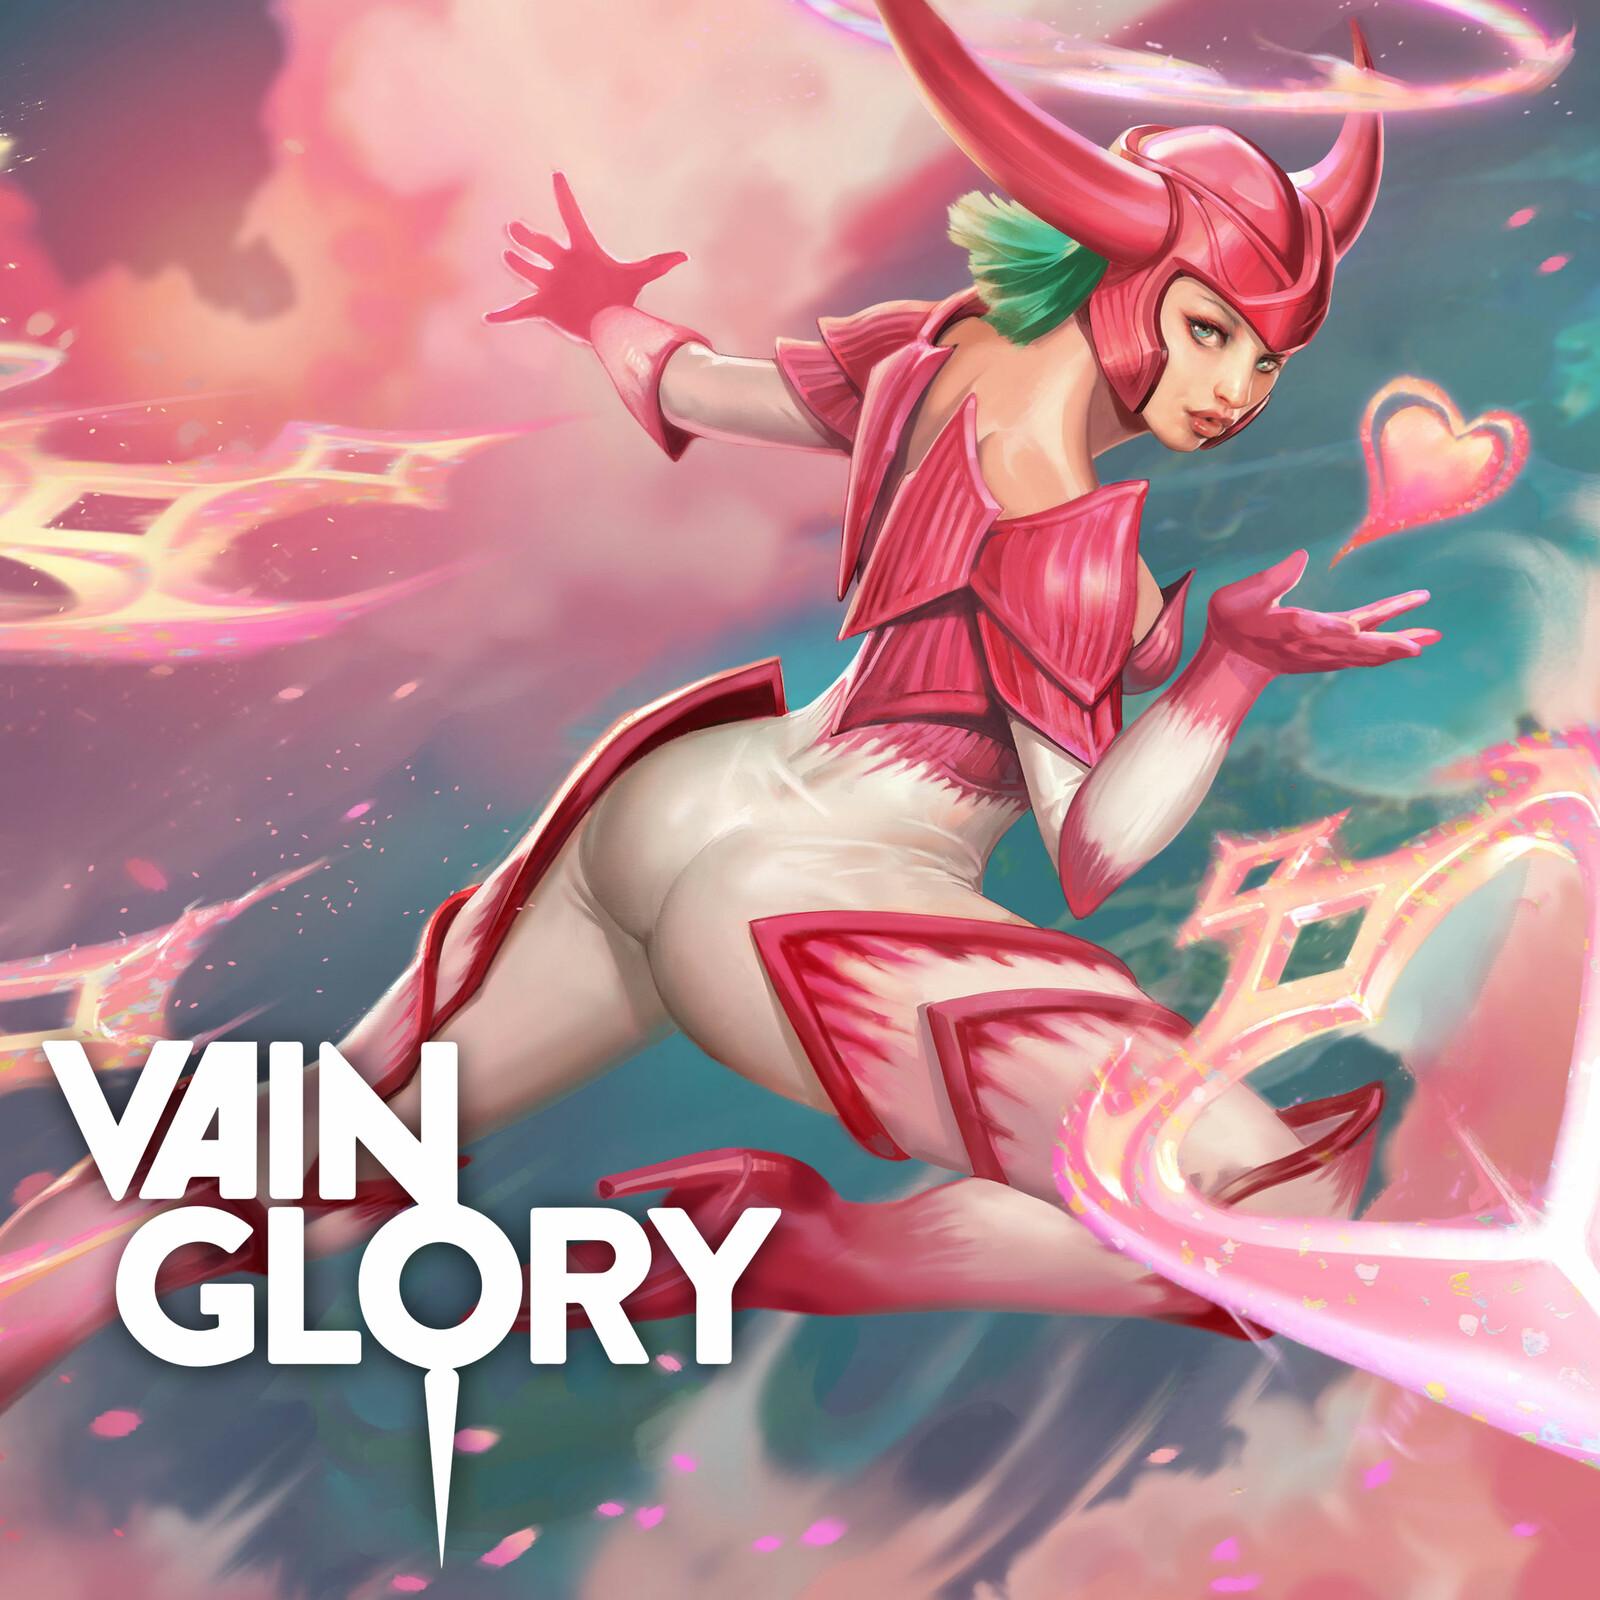 Soaring Heart Ishtar Splash - Vainglory Valentines day Skin